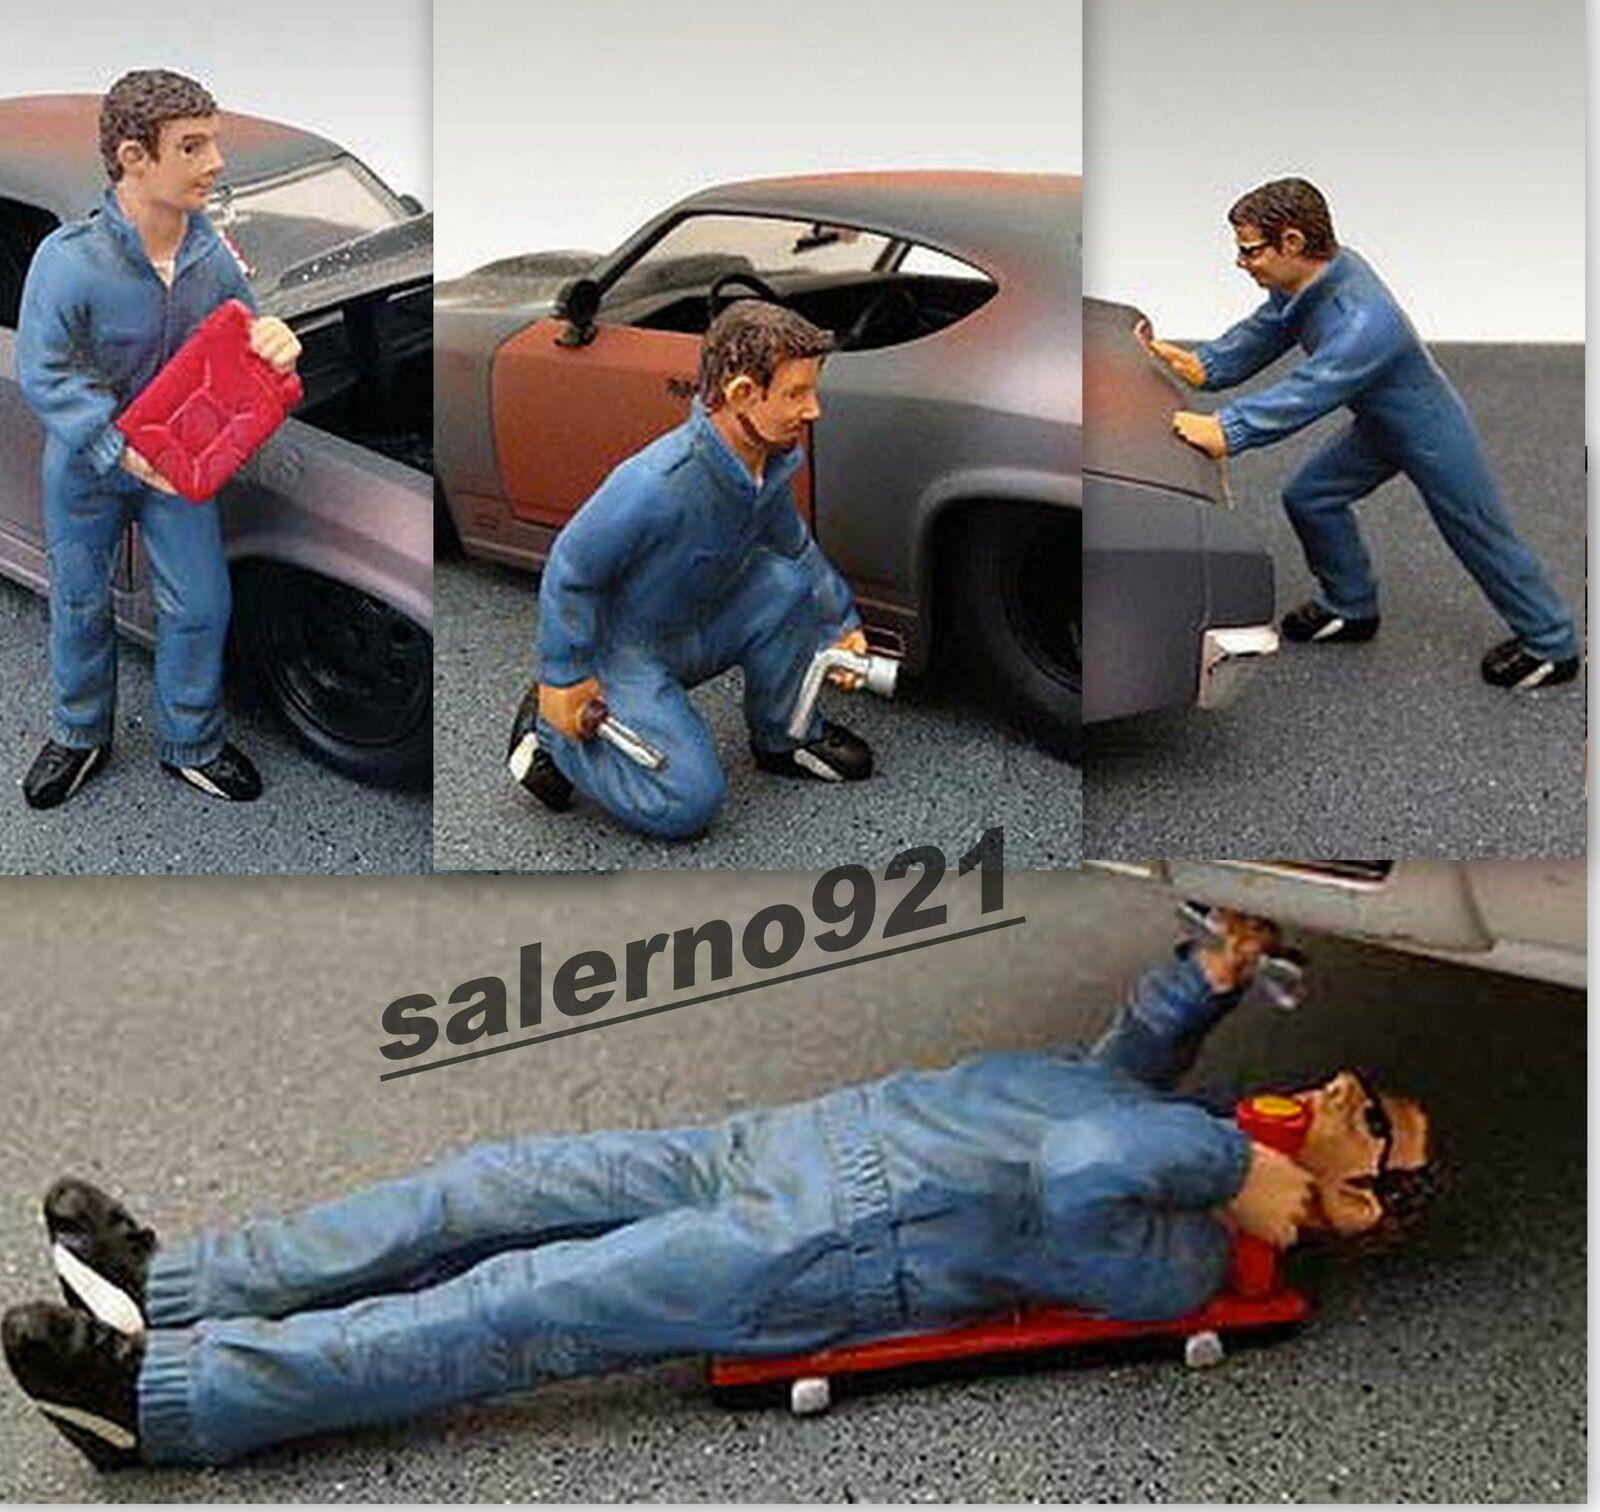 Mechanic Set Figures W/accessories 1:24 (g) Scale Garage Diorama